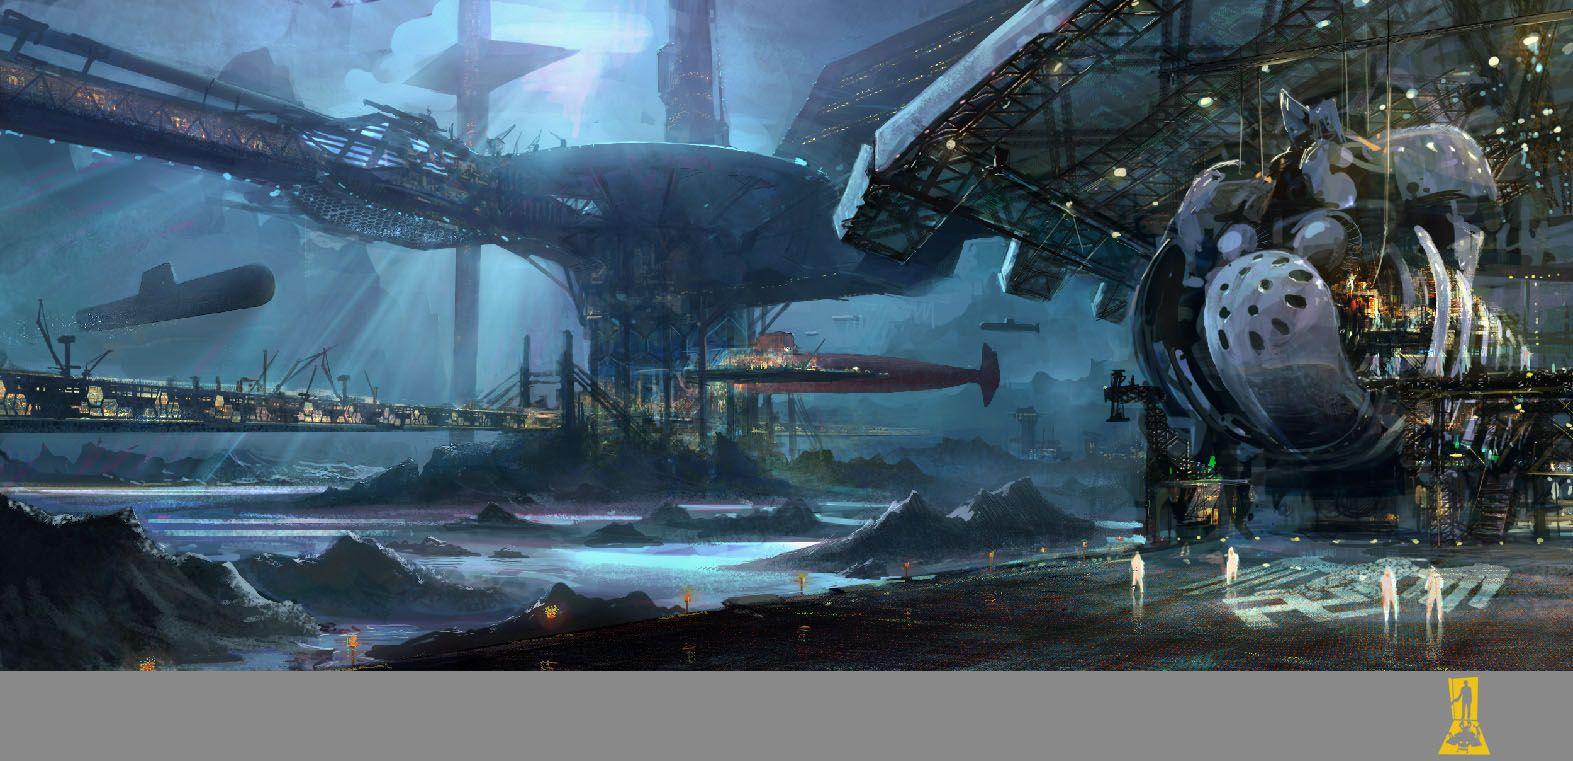 Futuristic Underwater Spaceship People Station Spacestation Underwater City Concept Art Underwater